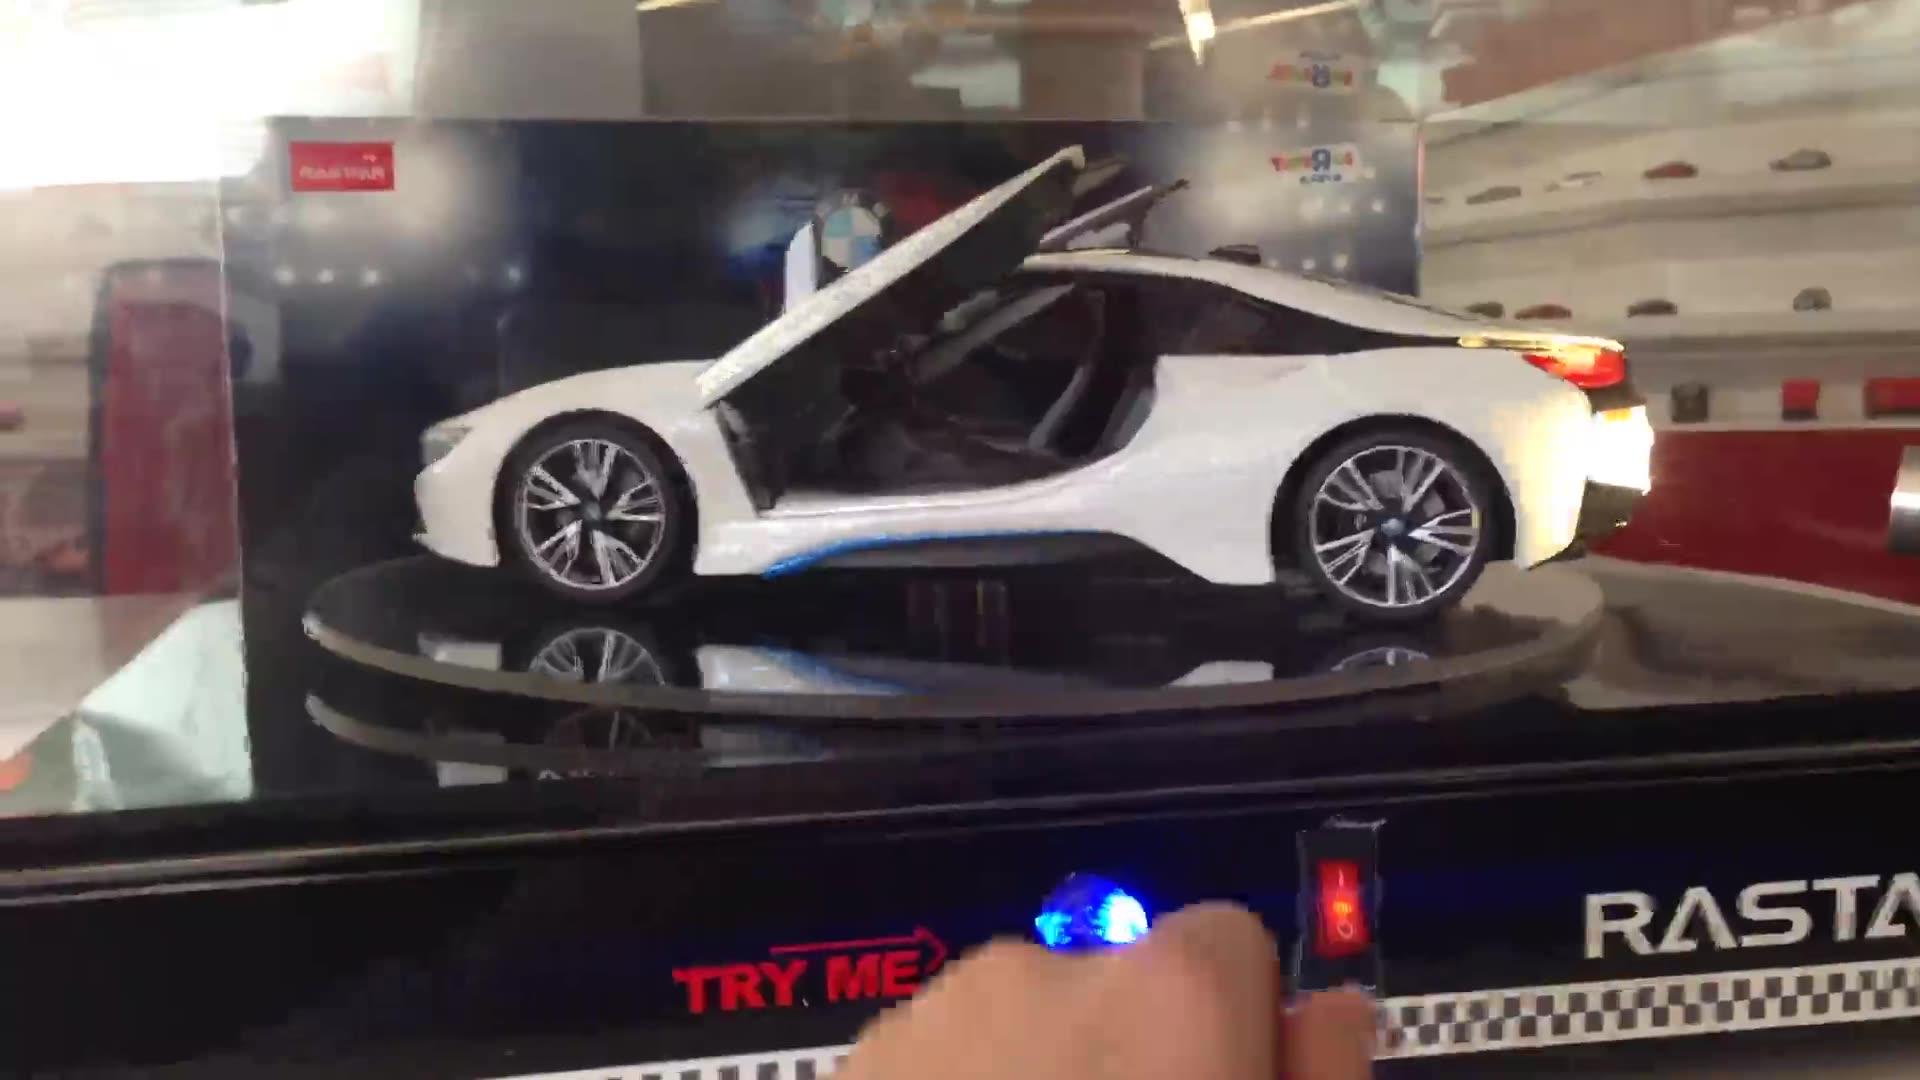 Rastar USB charge BMW best electric rc car toy nice real car body scale